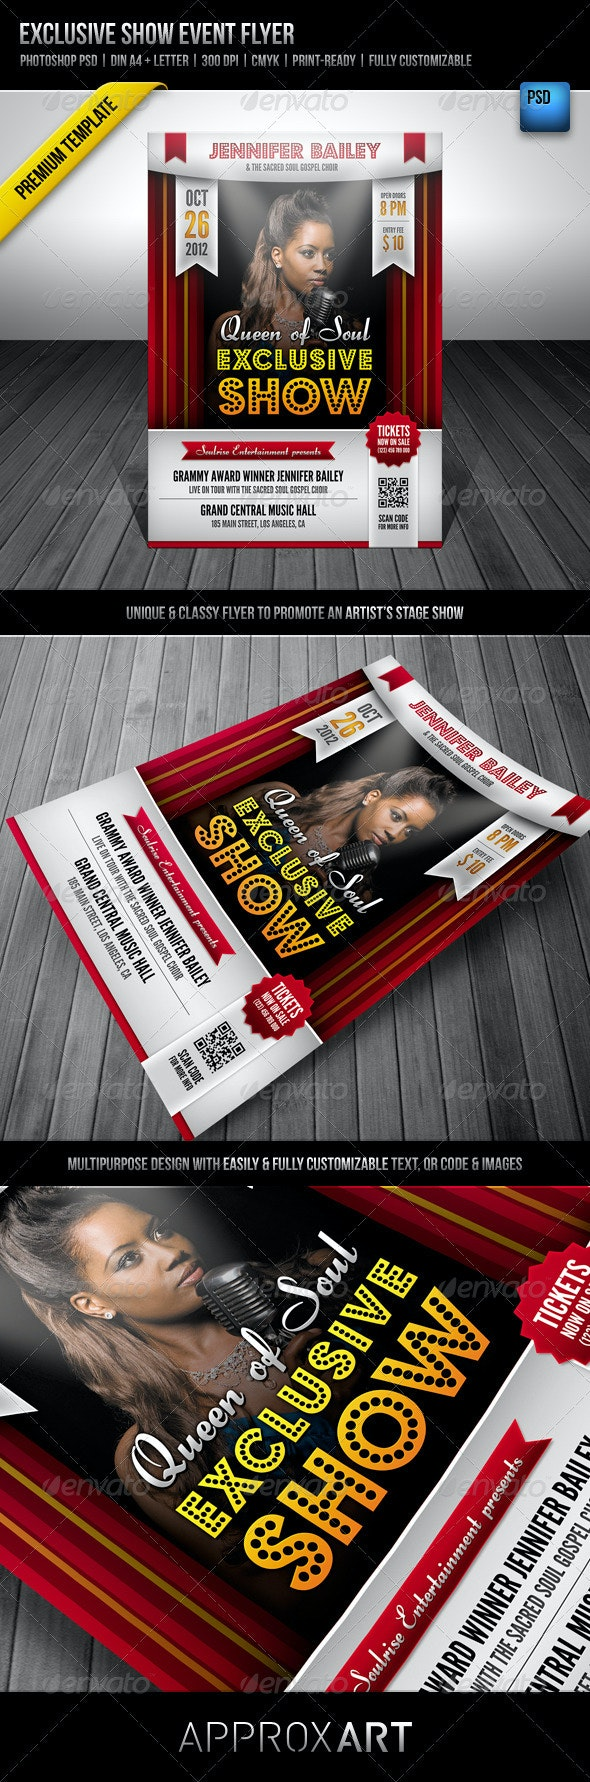 Exclusive Show Event Flyer - Miscellaneous Events